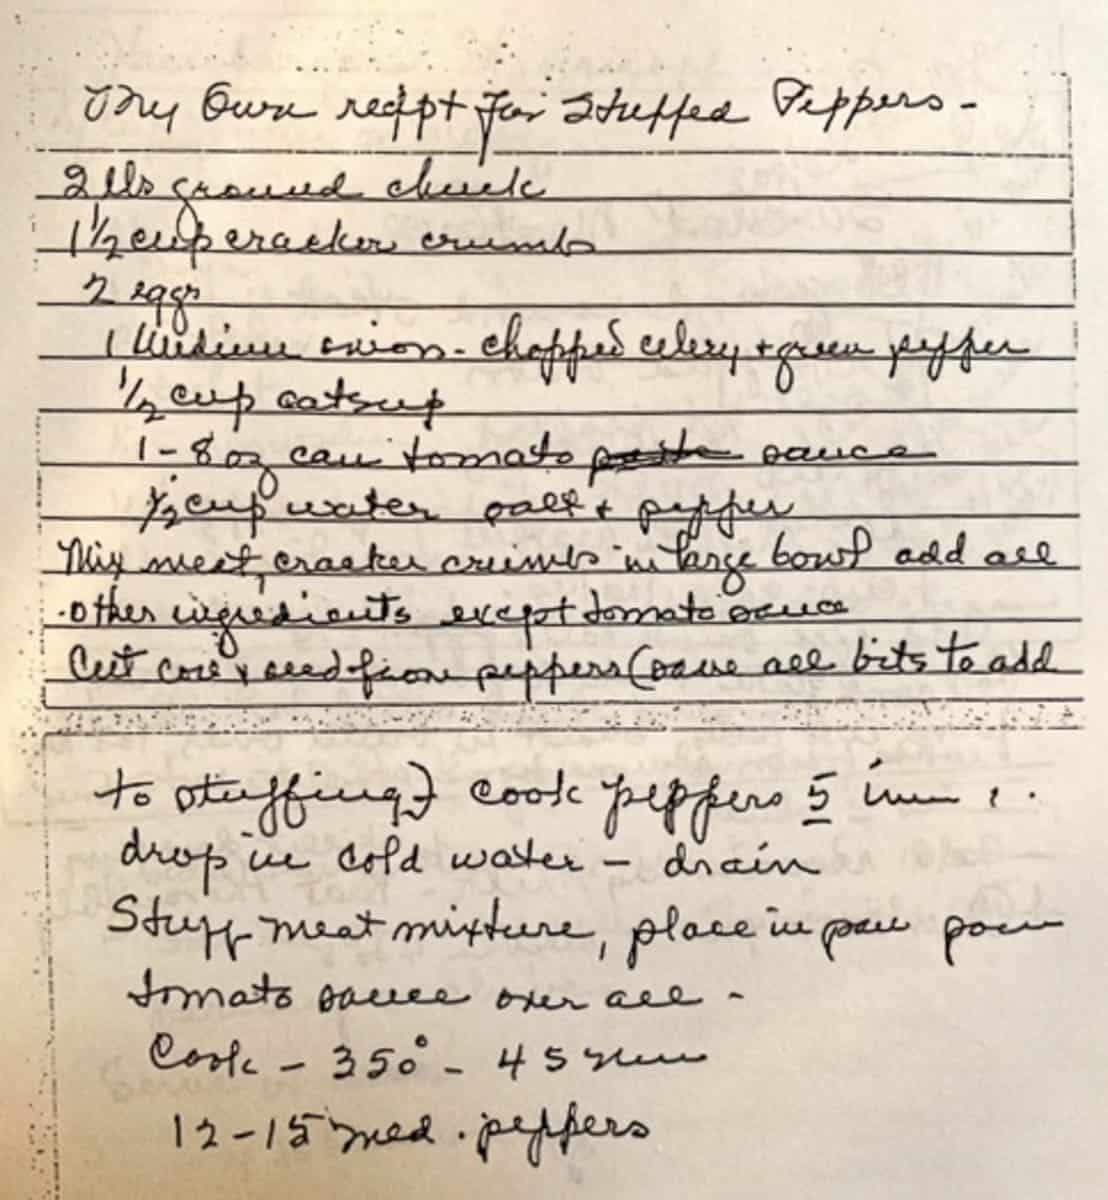 Original handwritten recipe for stuffed peppers